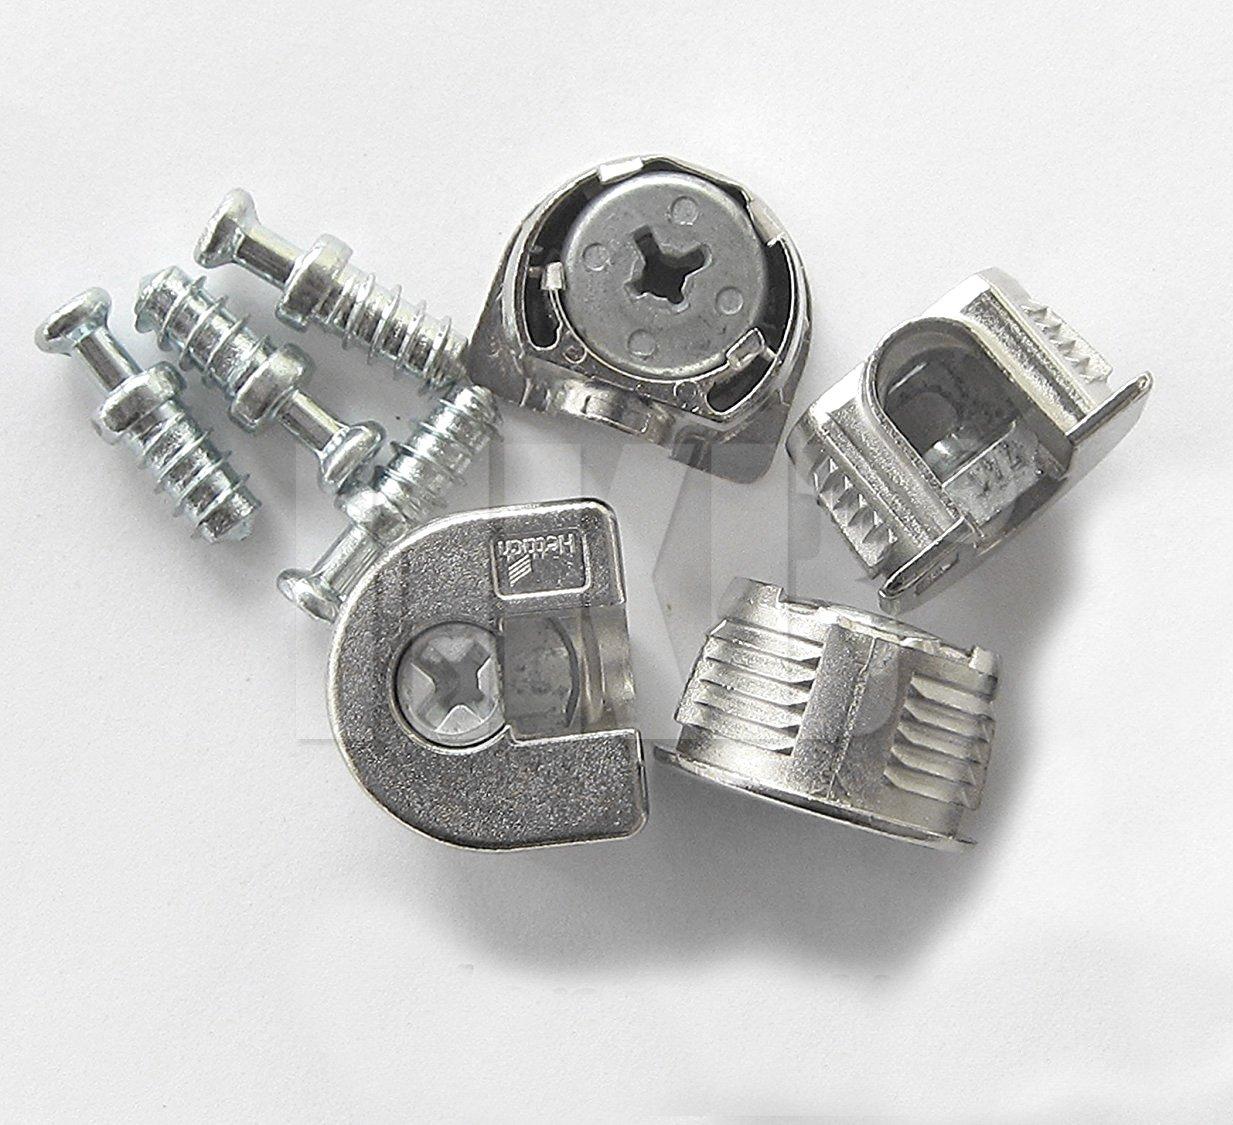 HKB ® 16 Stück Exzenter Verbindungsbeschlag VB 35/16, ø 20 mm, Zinkdruckguss vernickelt, Hersteller Hettich, Artikel-Nr. 9130274